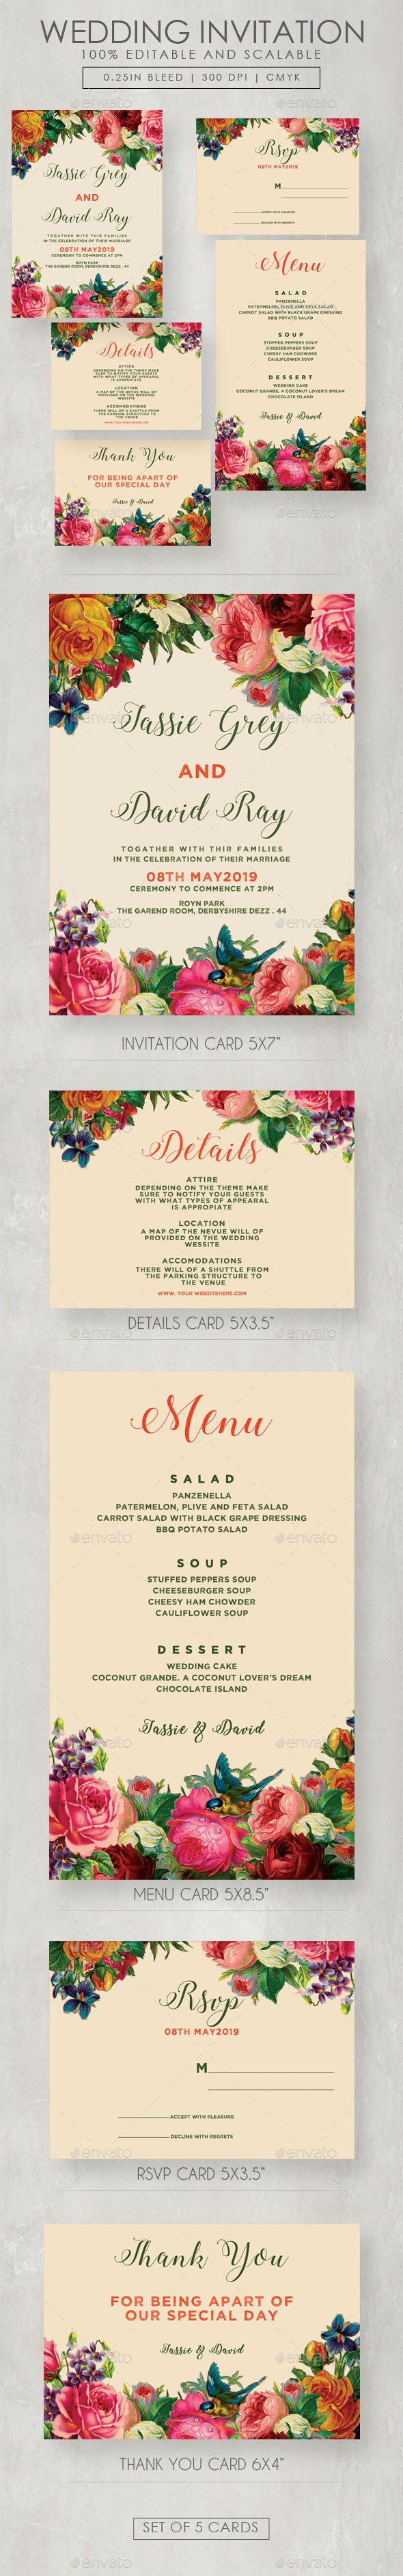 Flourish Wedding Invitation Suite - Weddings Cards & Invites